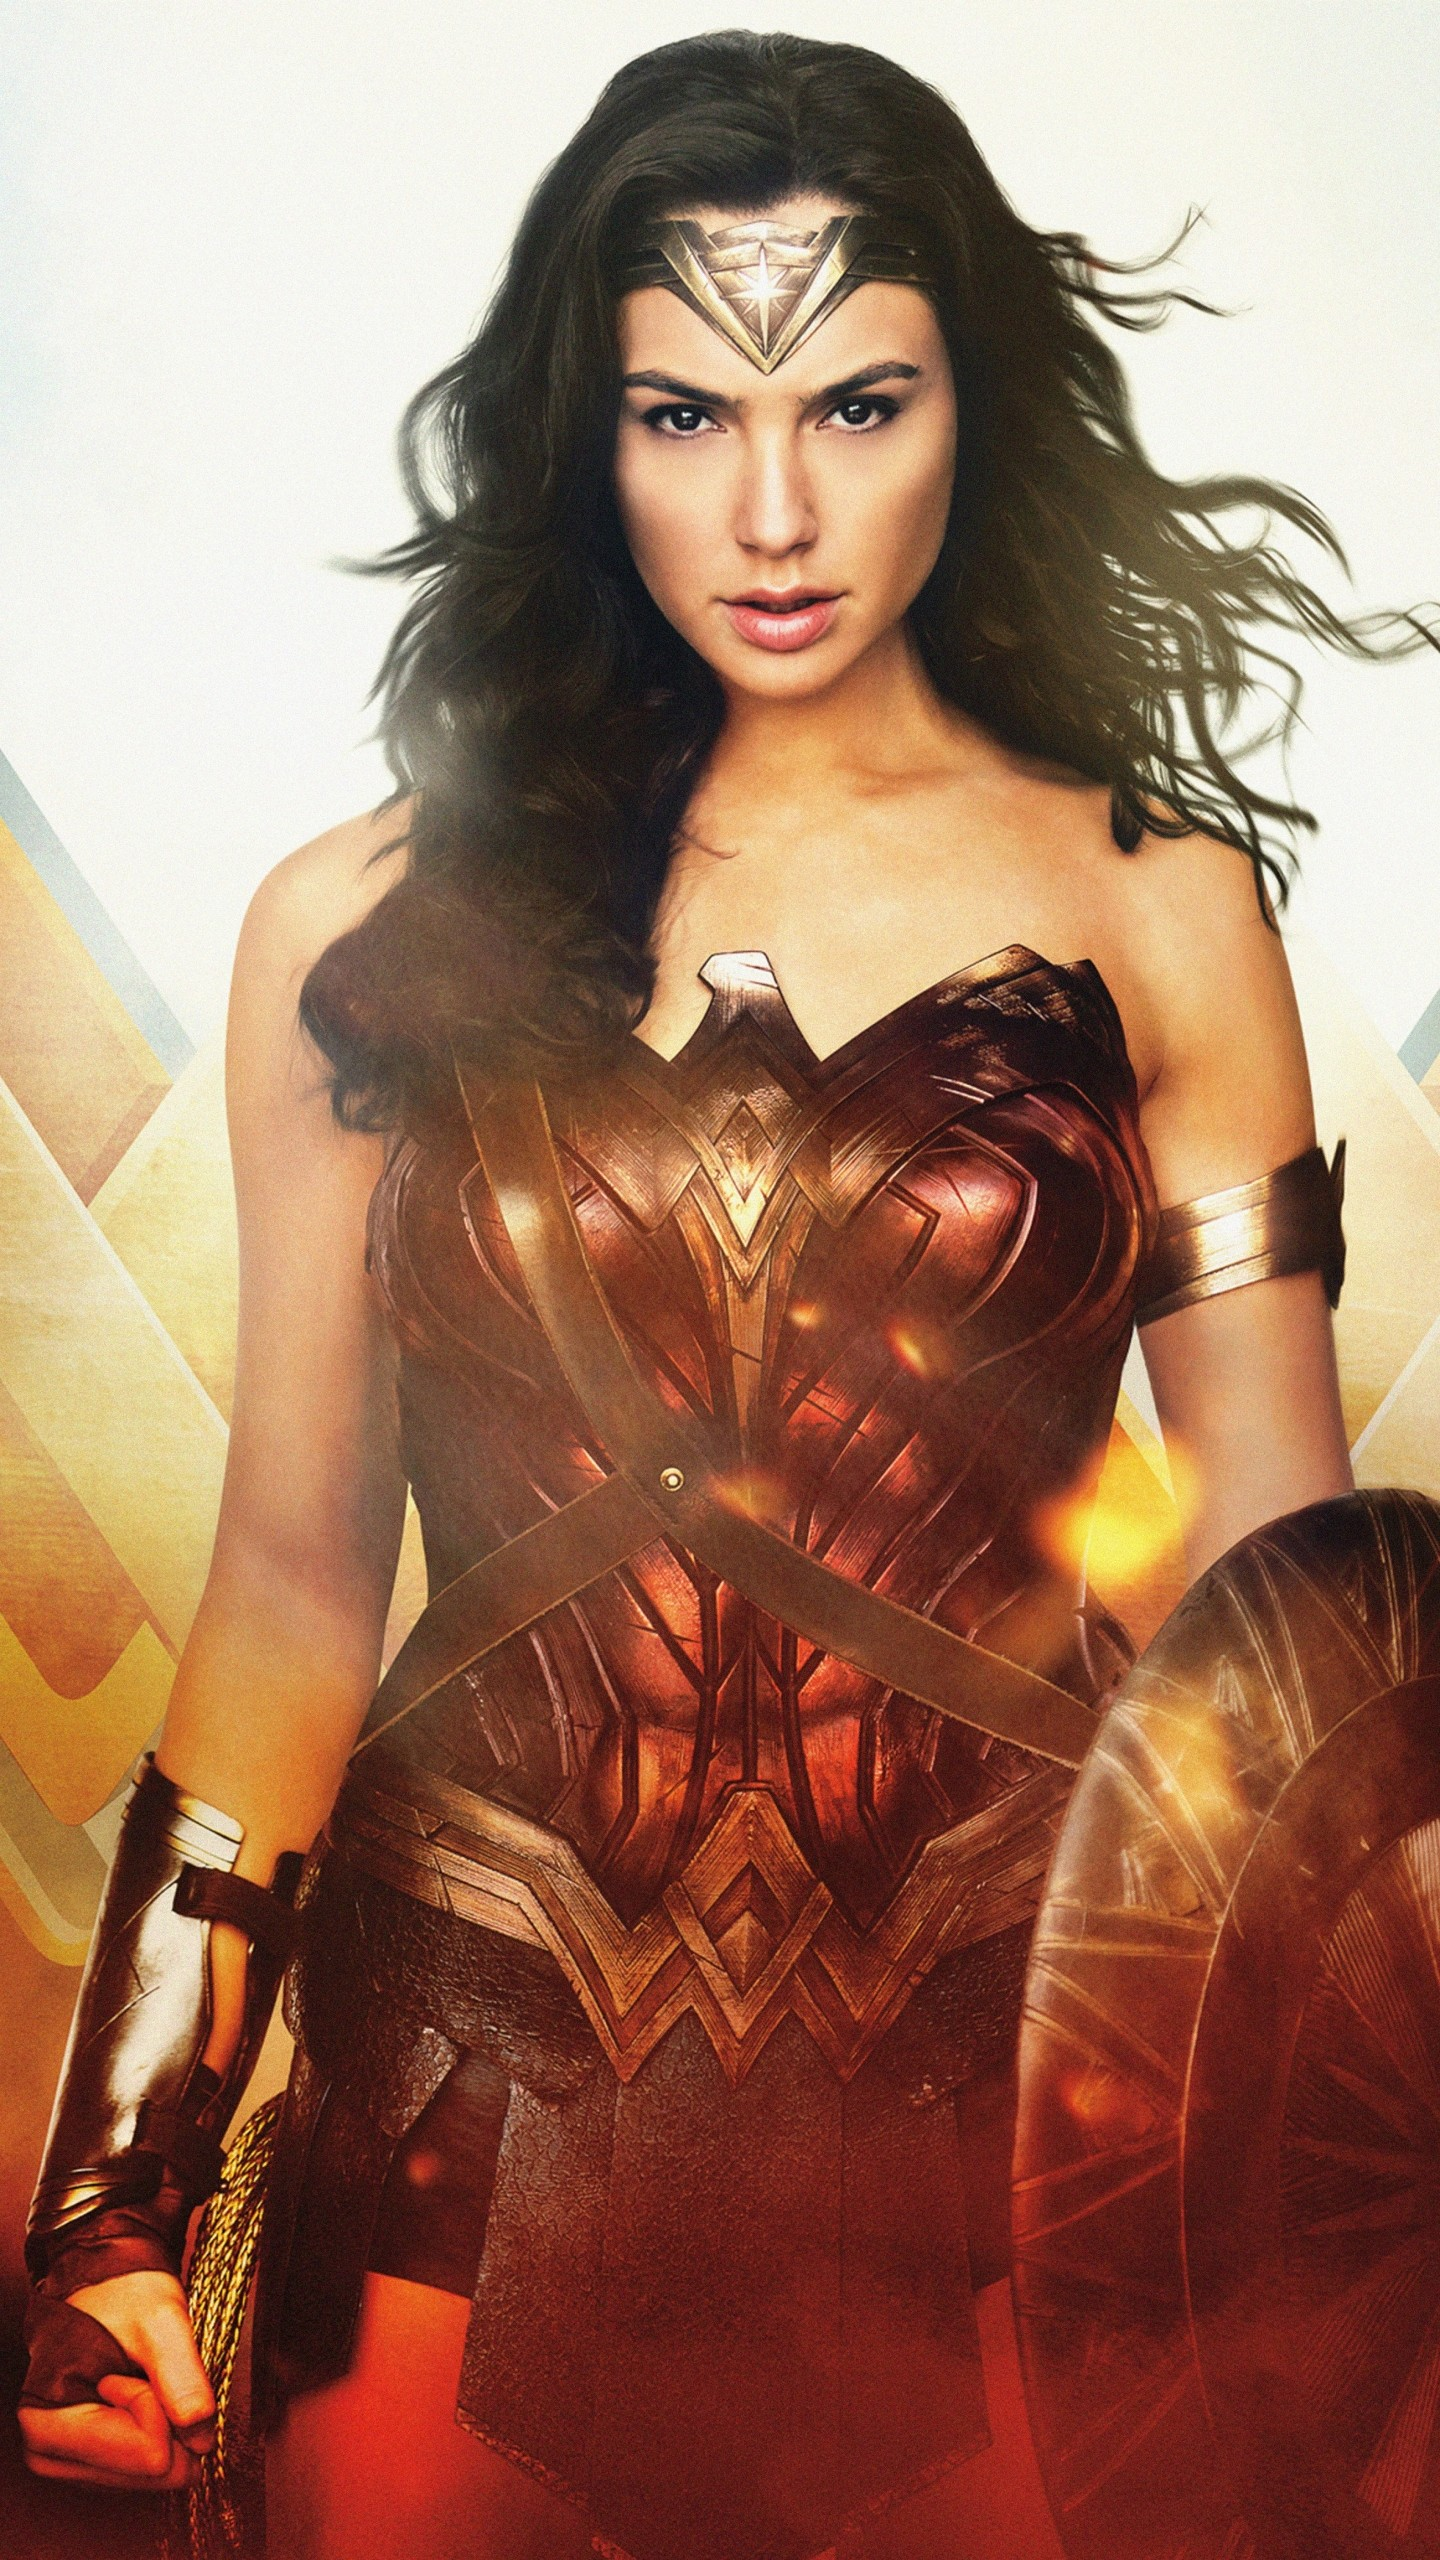 Res: 1440x2560, Movie / Wonder Woman () Mobile Wallpaper